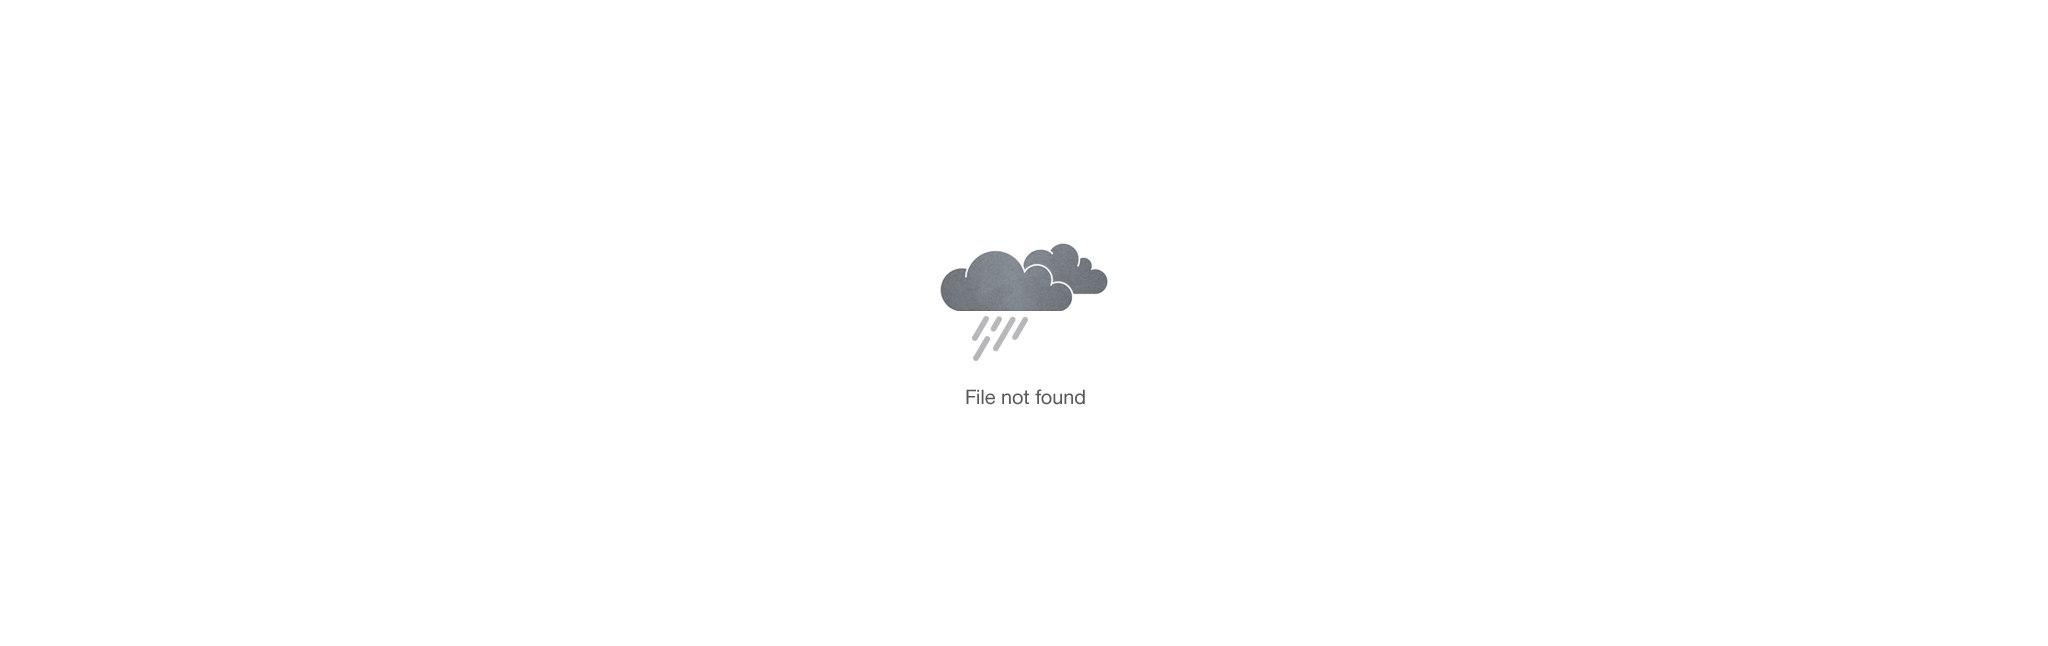 Sore Thumb - Amstrad logo